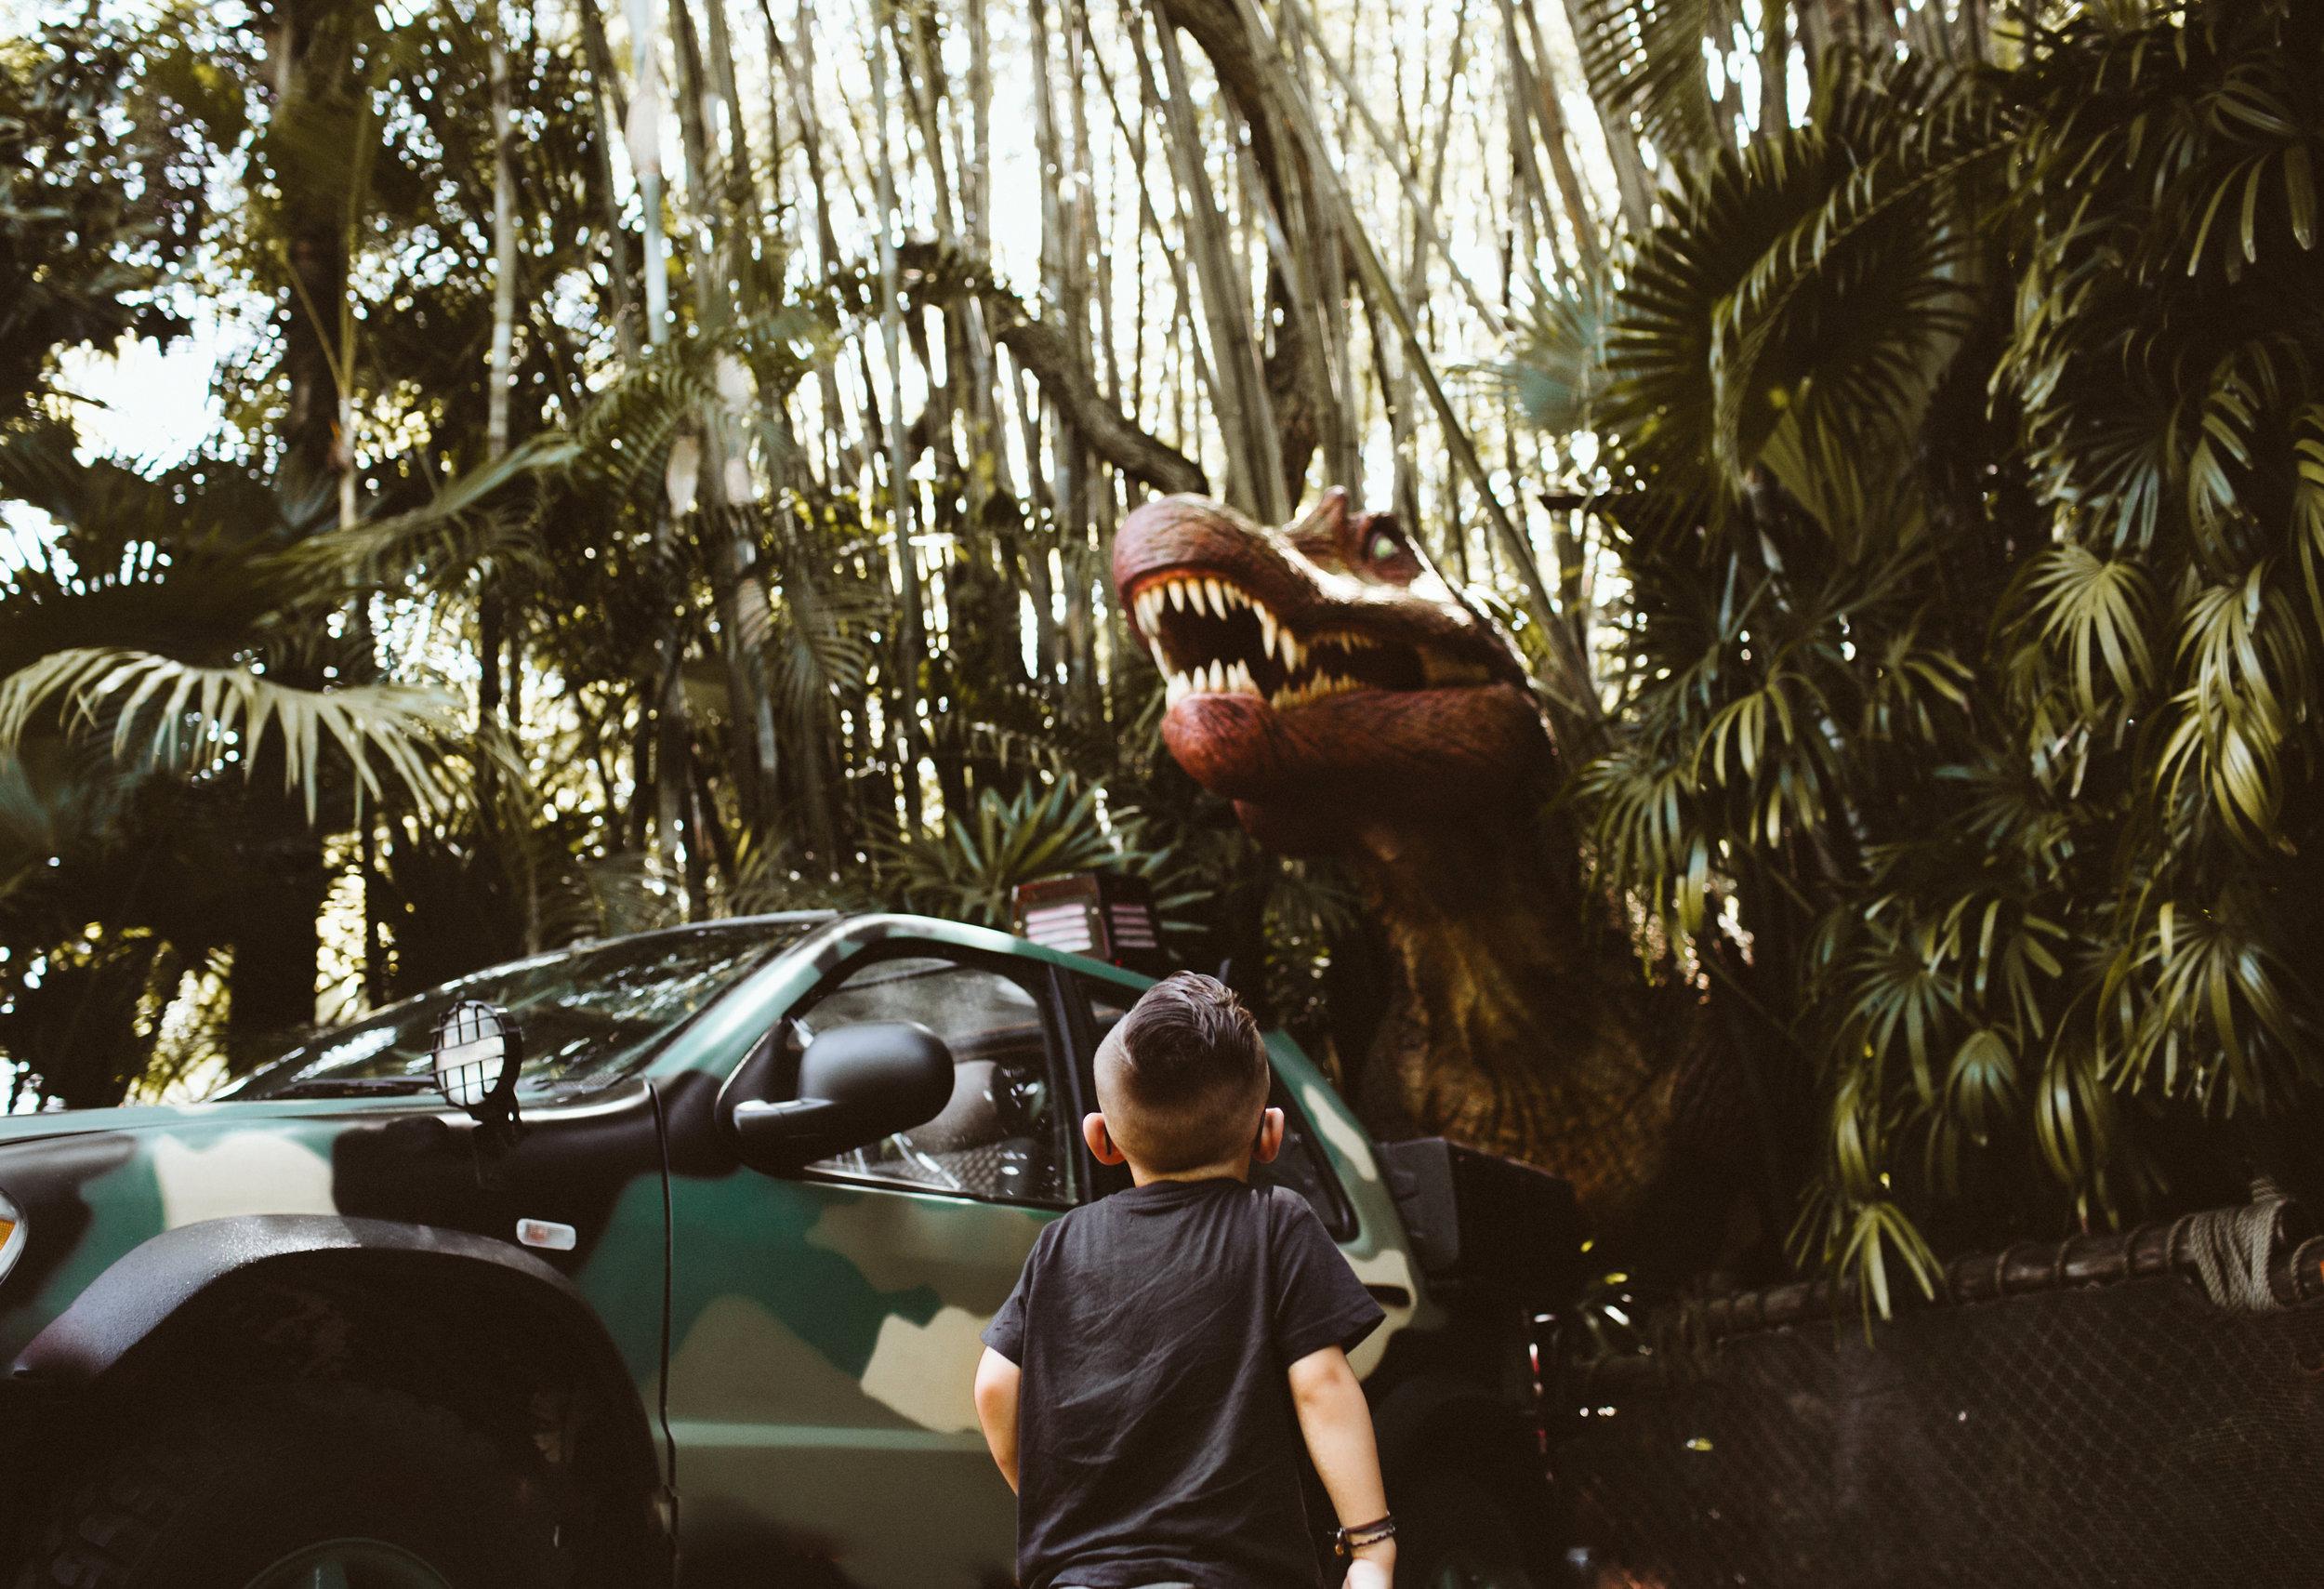 Universal Orlando | Vanessa Boy Photography | vanessaboy.com |-11.com |final2.jpg